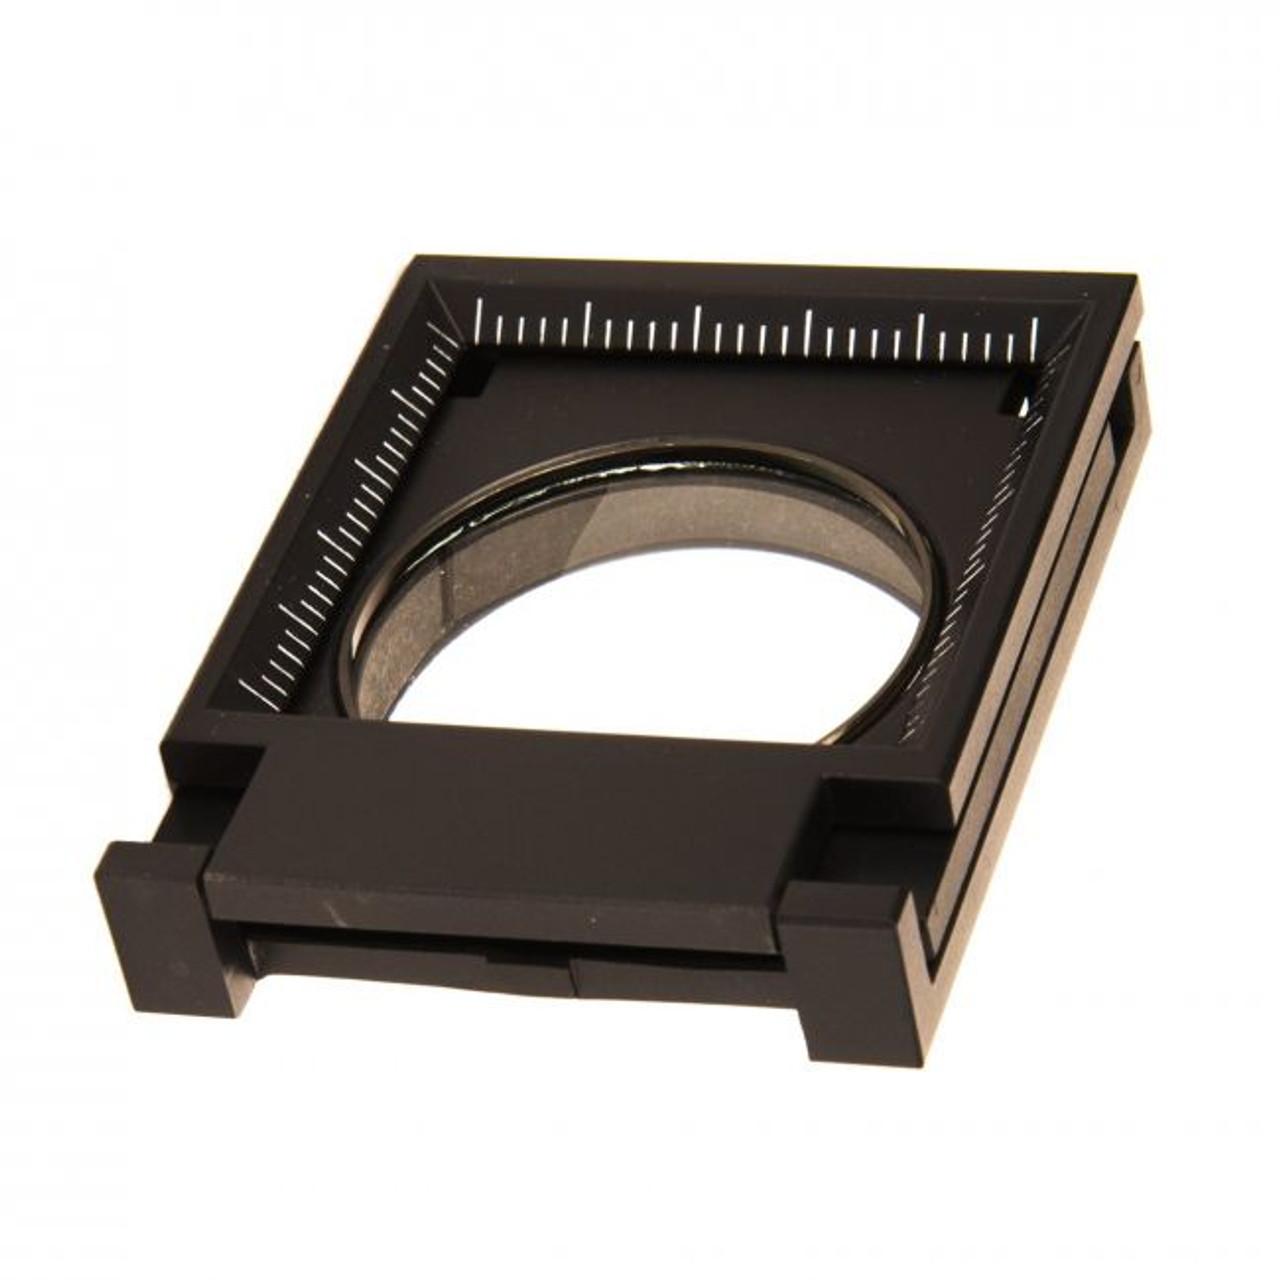 Peak 6X 25mm Zinc Measuring Magnifier Linen Tester 1006 WZ3 (PK-1006WZ3)